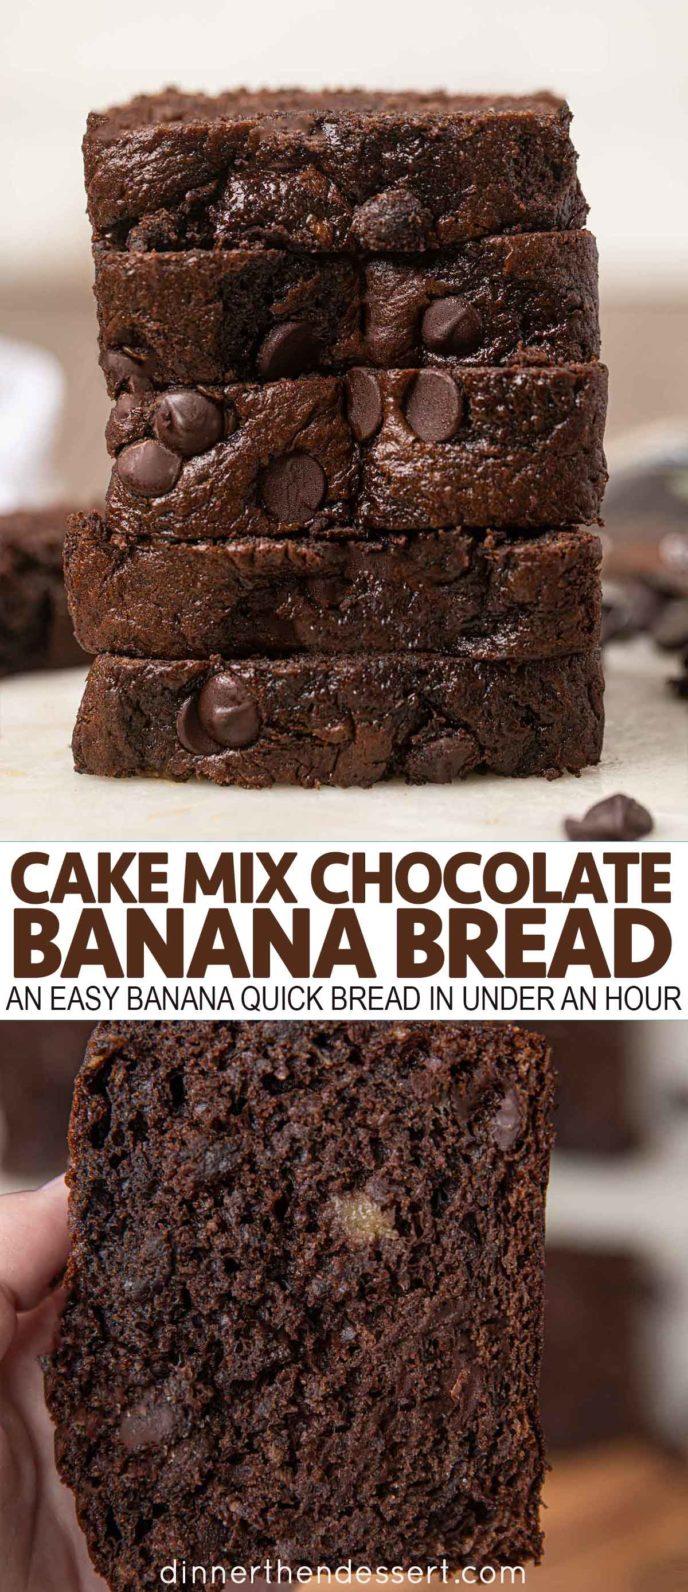 Cake Mix Chocolate Banana Bread